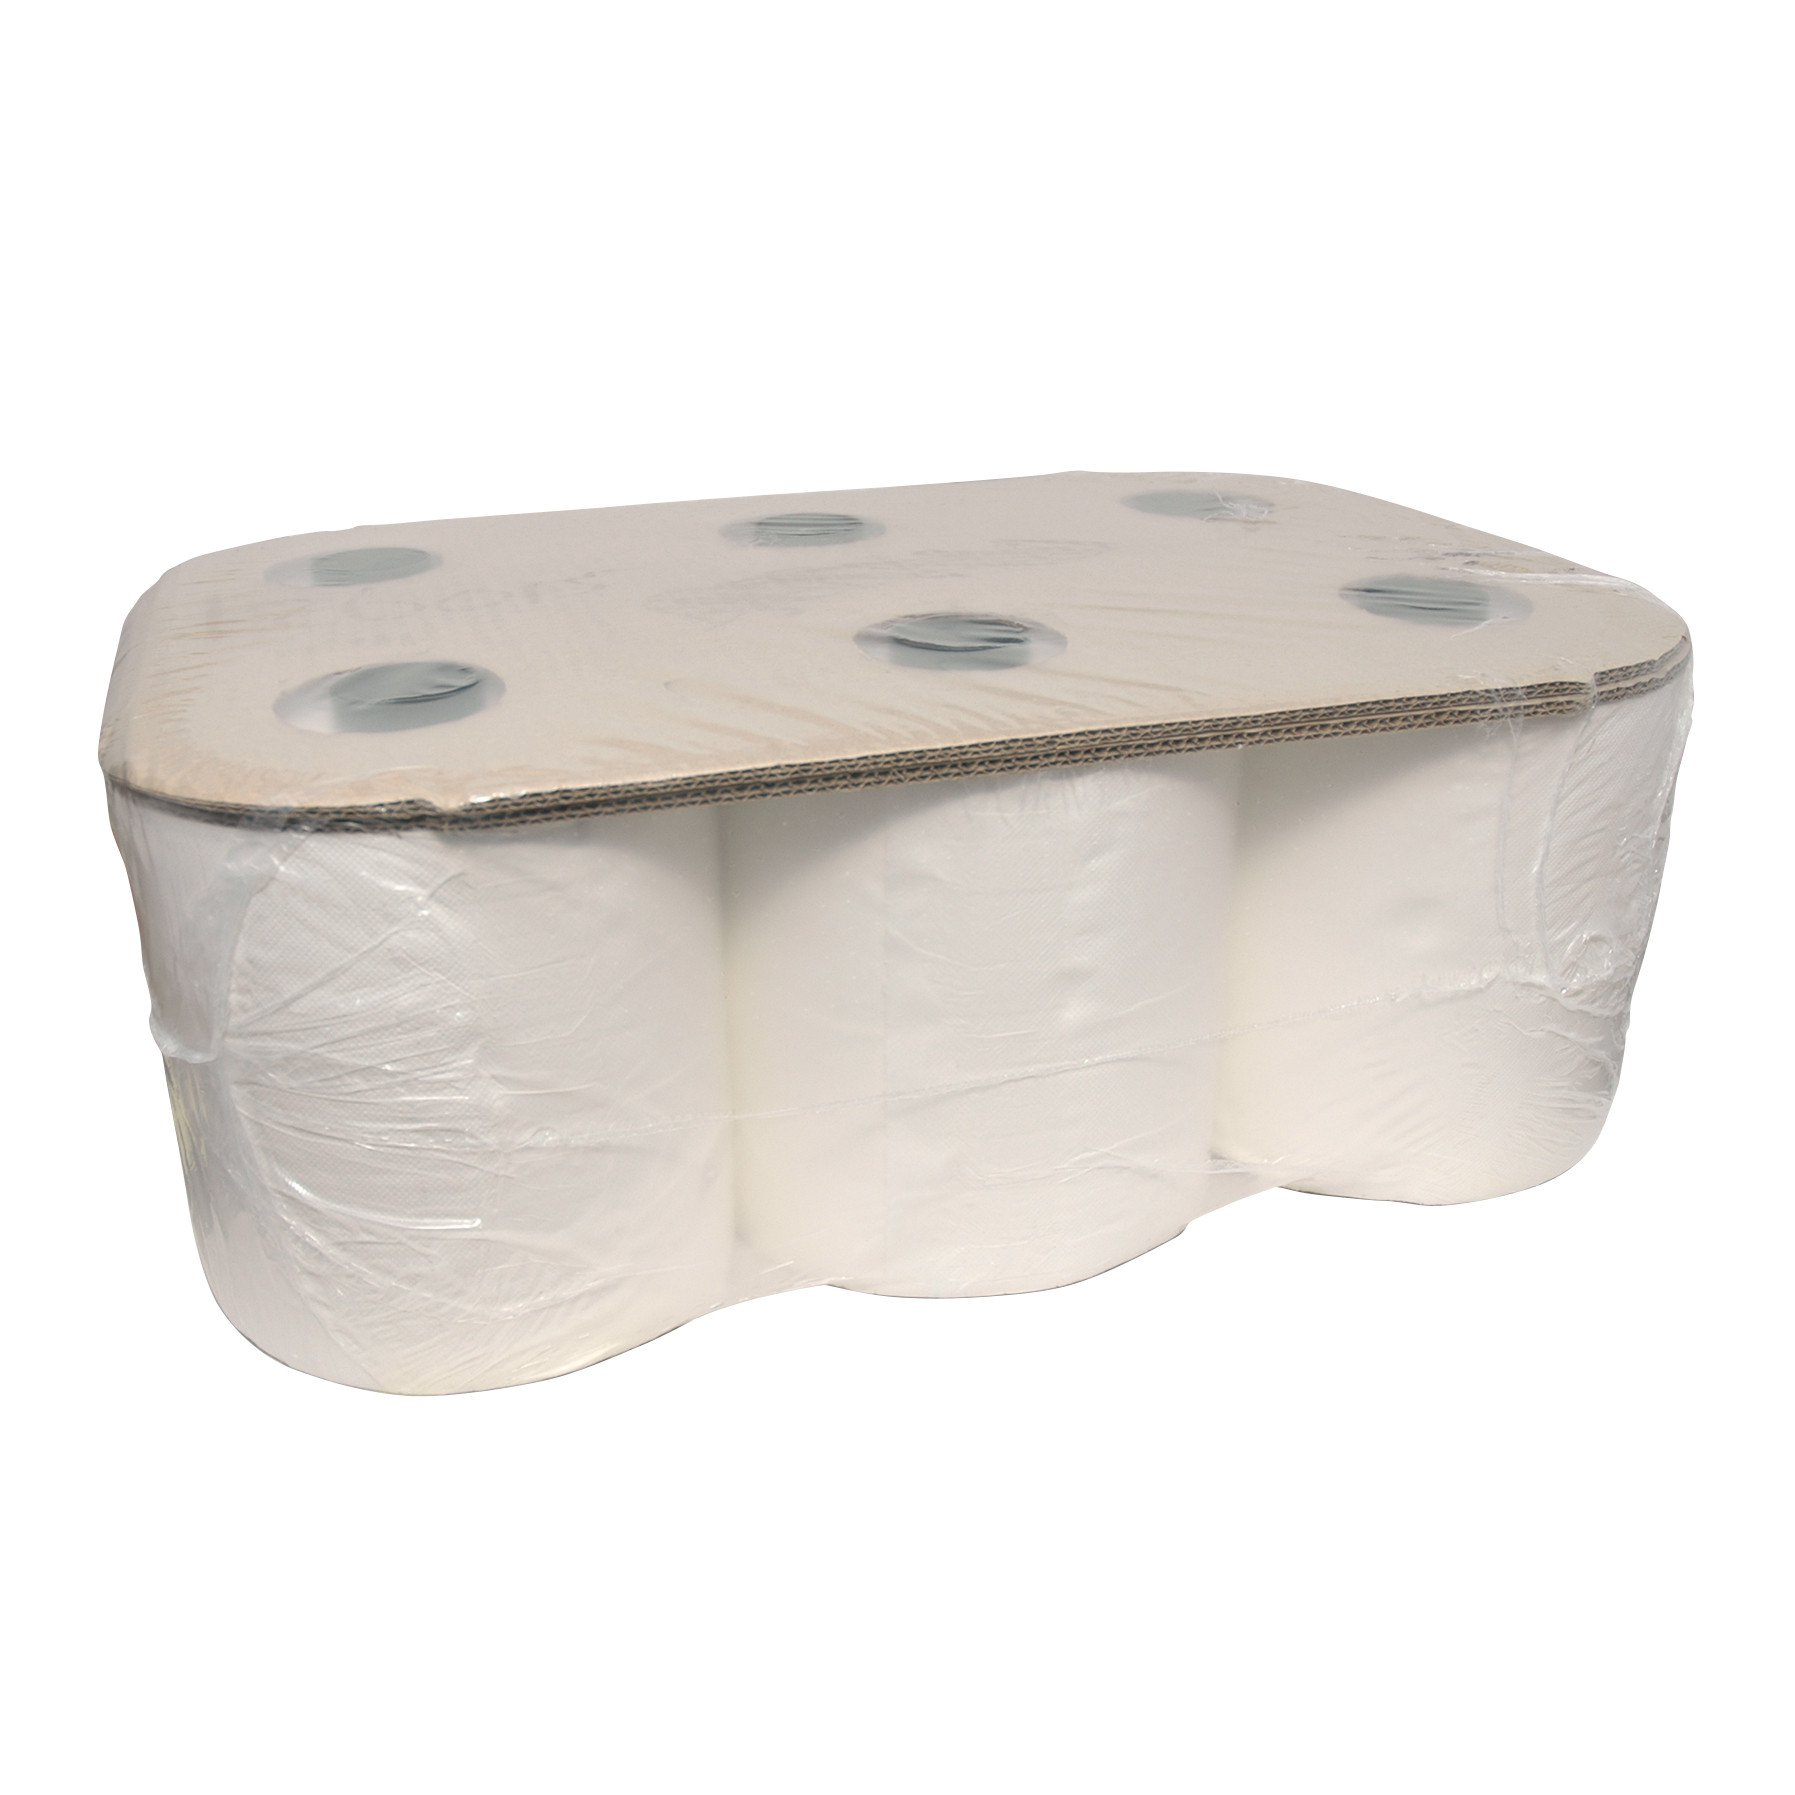 Euro Products | Handdoekrol | Cellulose | Lotus enmotion | 6 x 150 meter